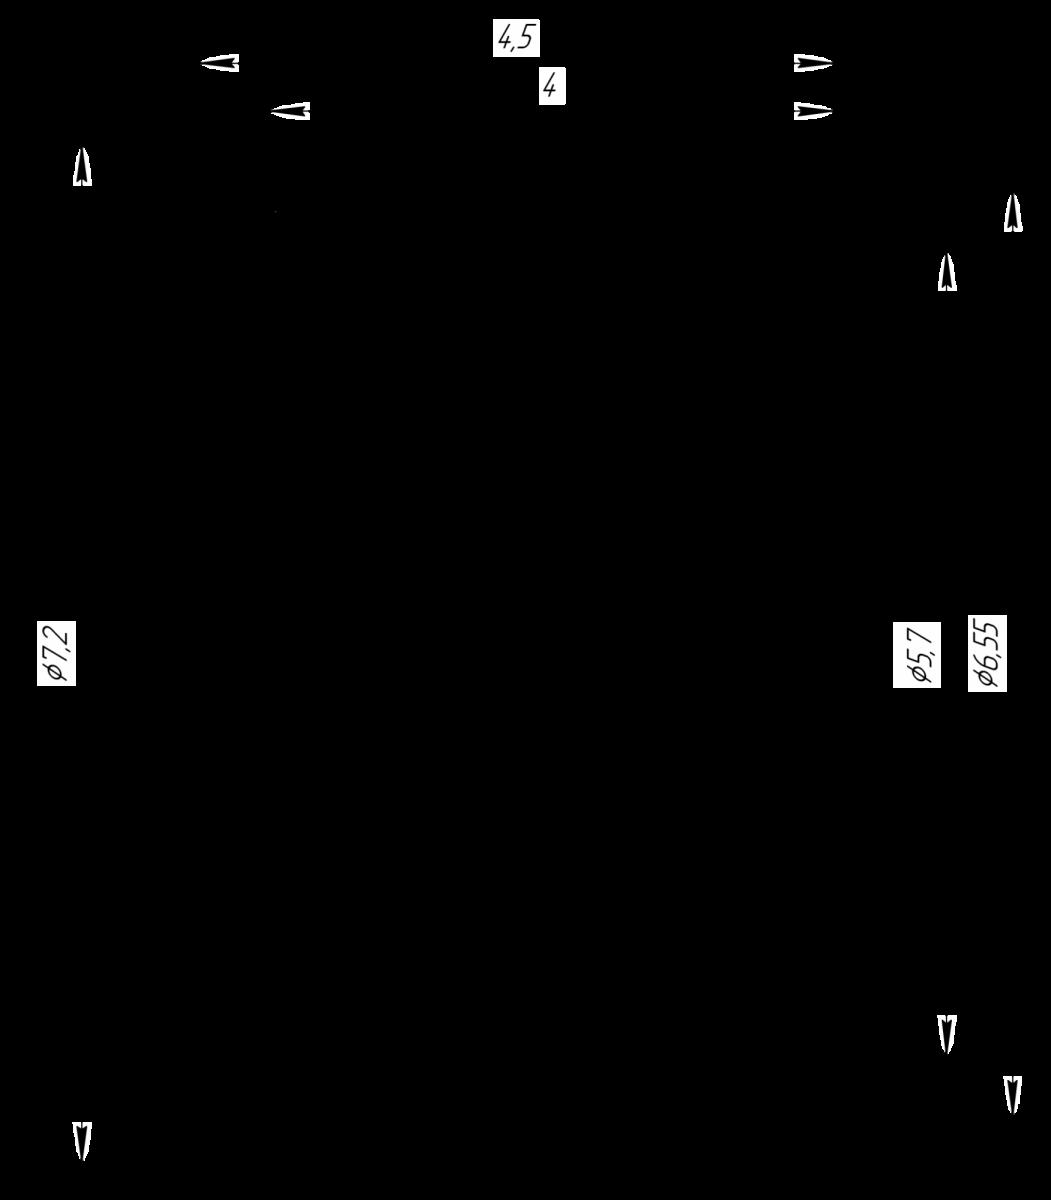 Втулка для полного протокола Ø5.7